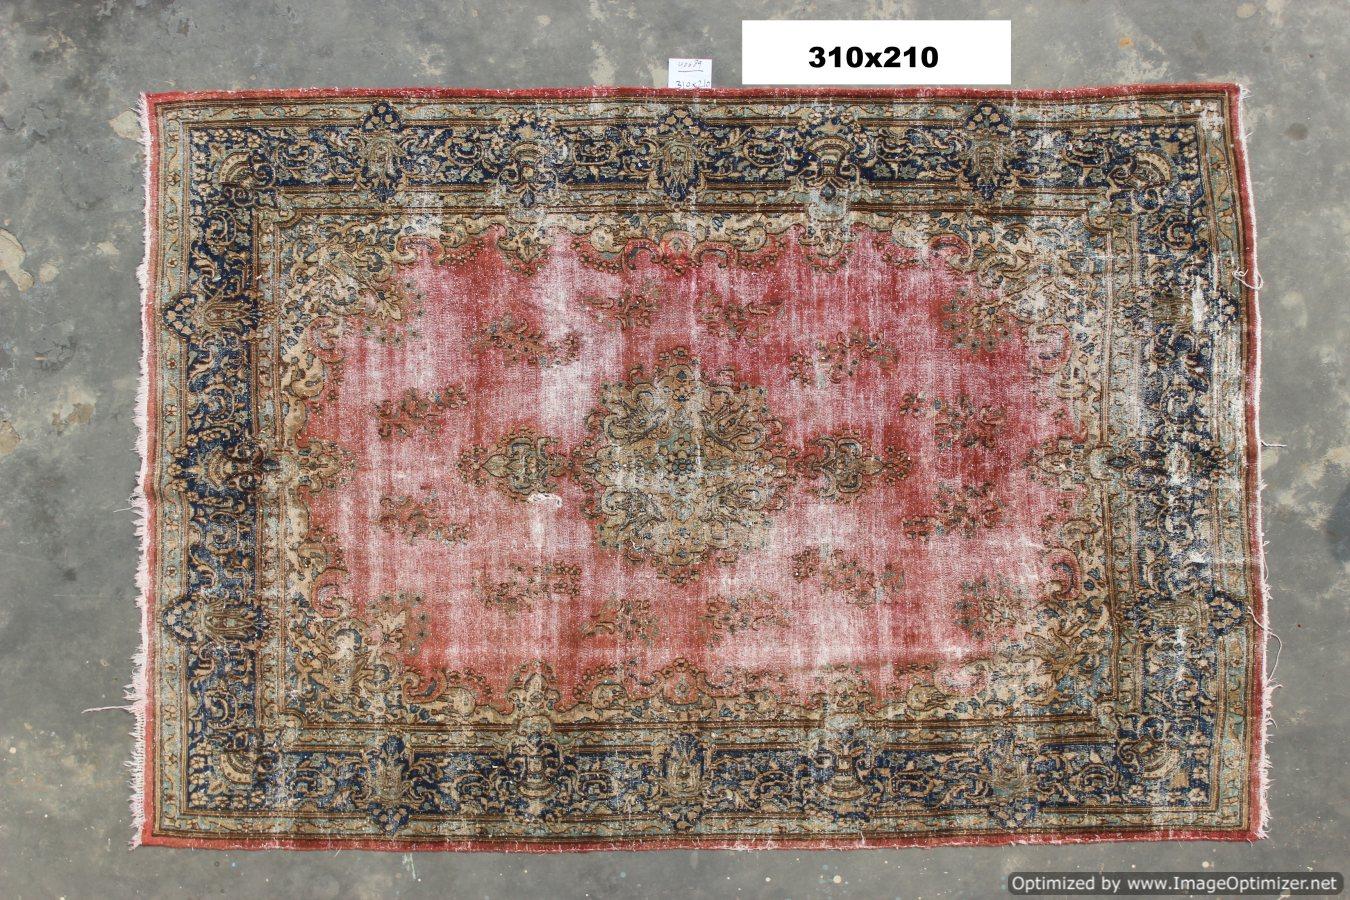 Vintage recoloured perzisch tapijt 40689  (310cm x 210cm)  VERKOCHT!!